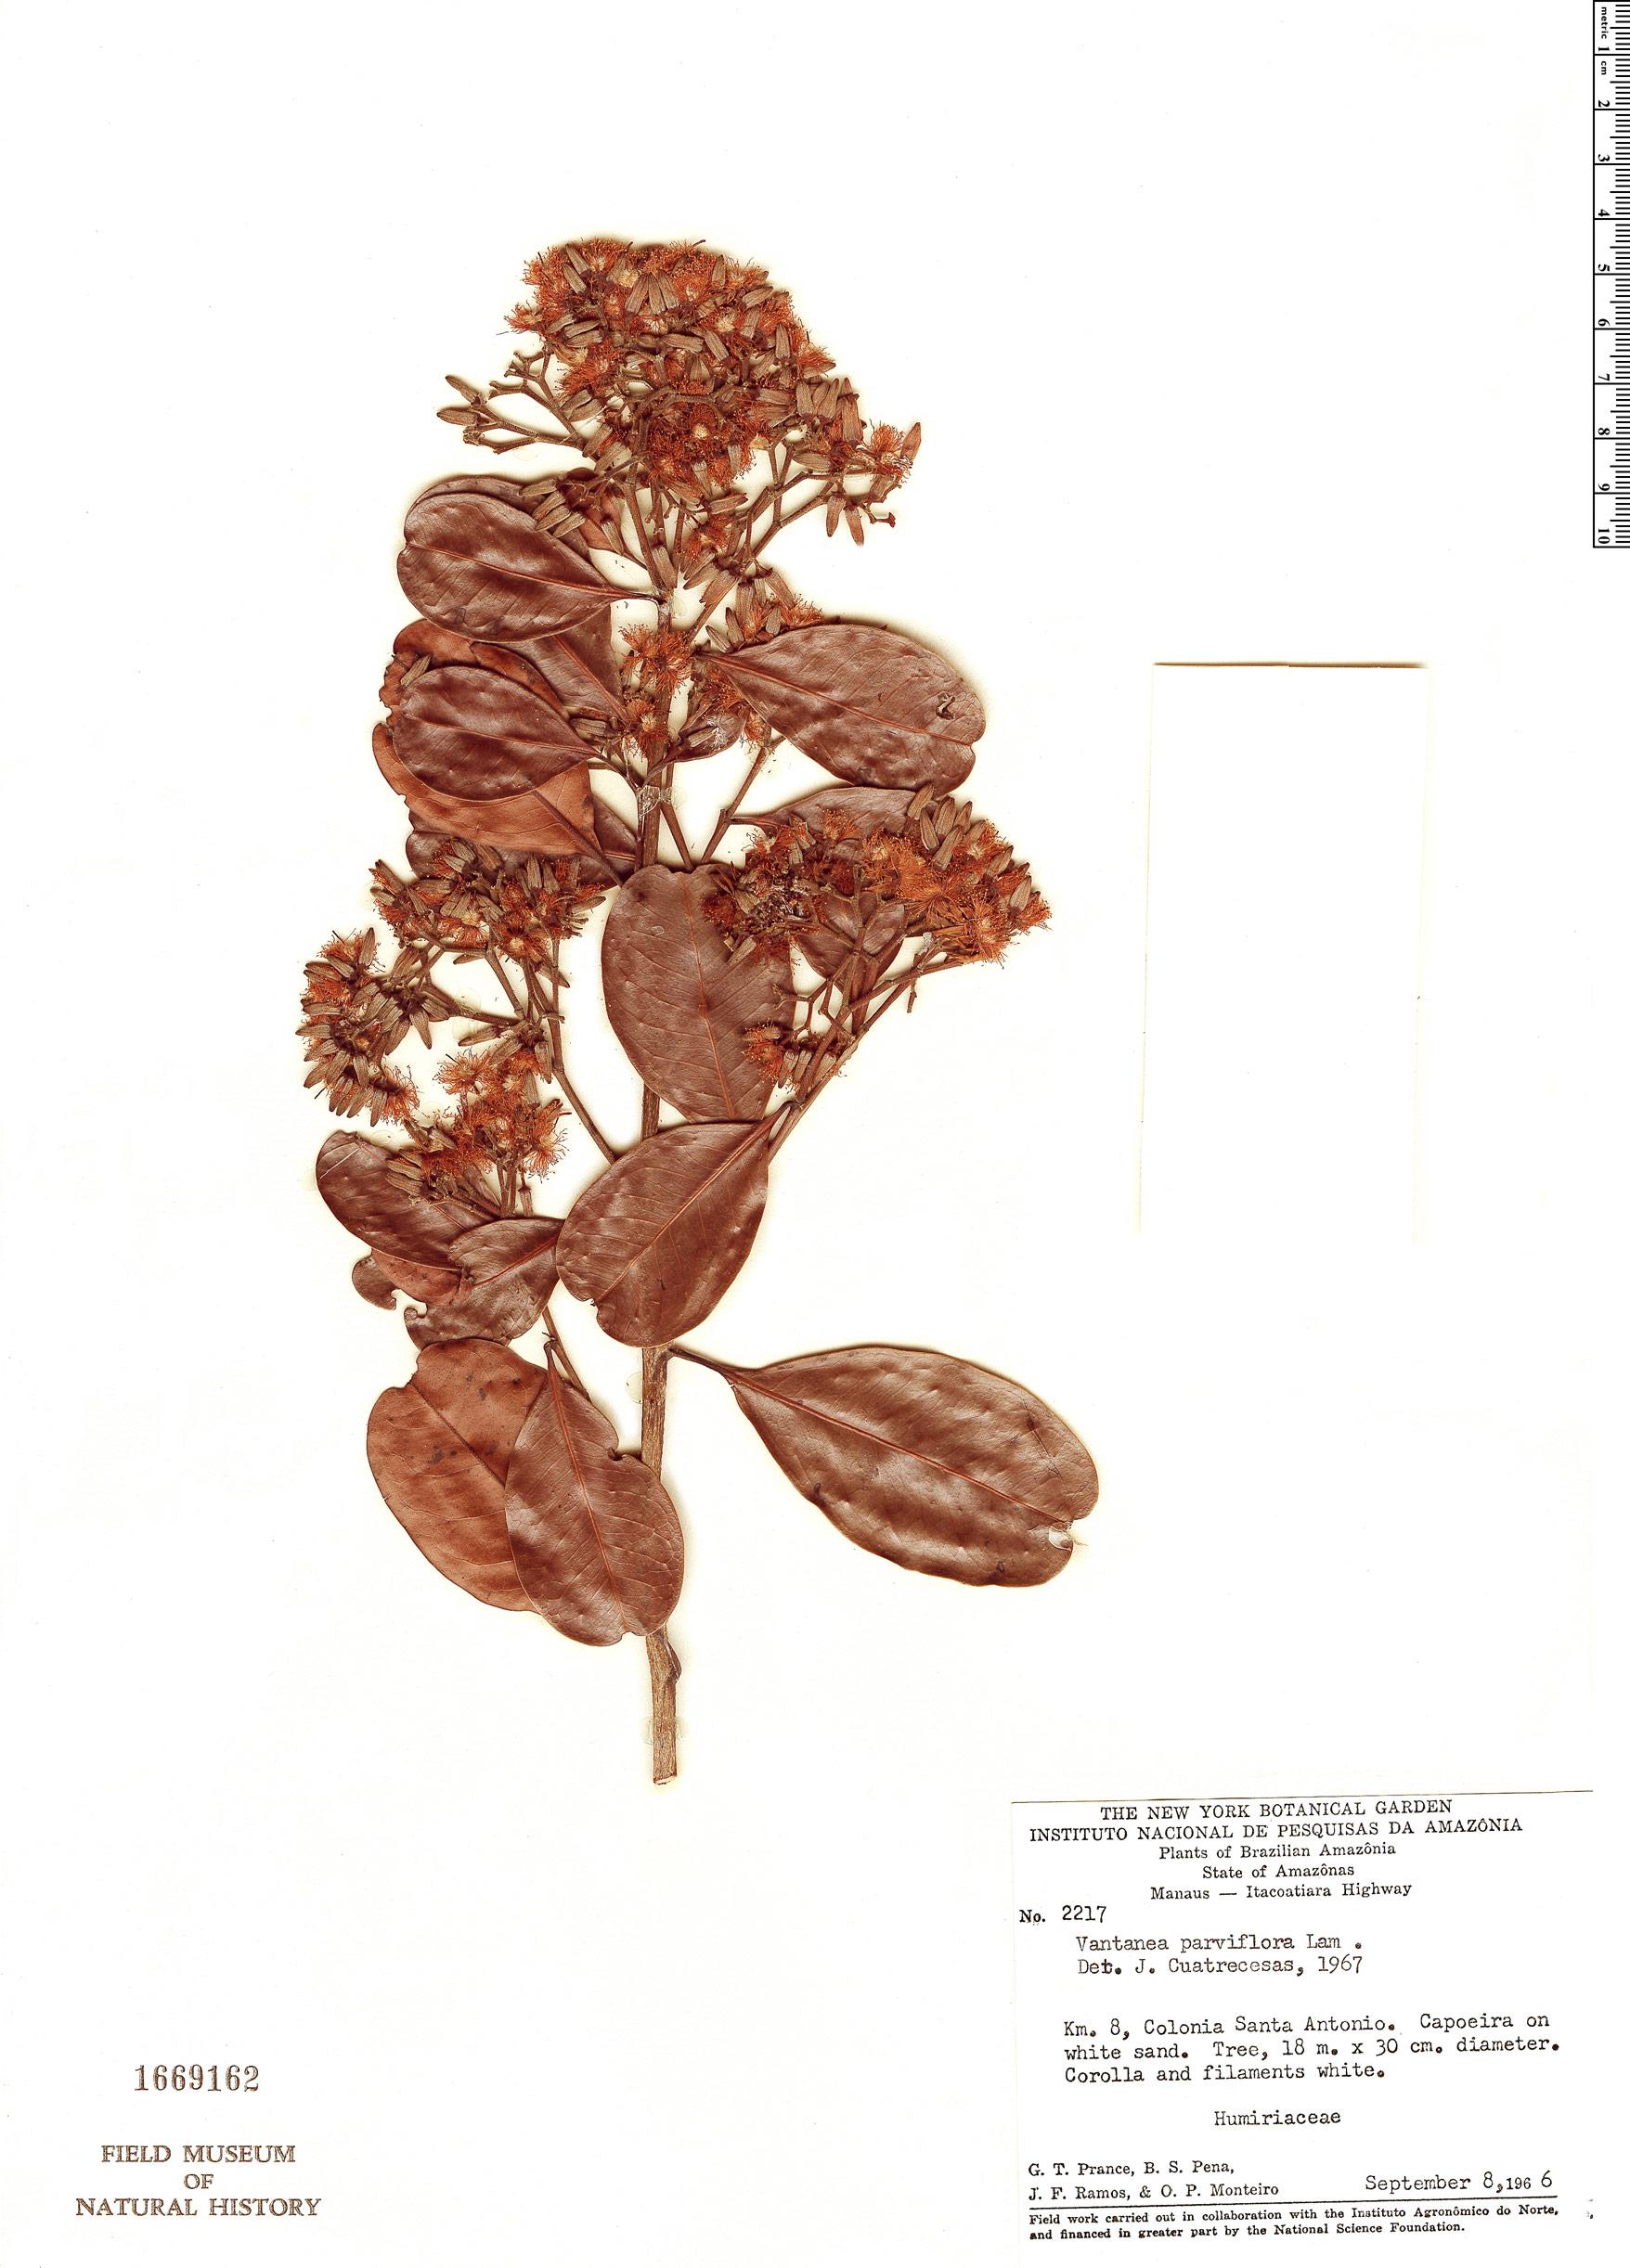 Specimen: Vantanea parviflora